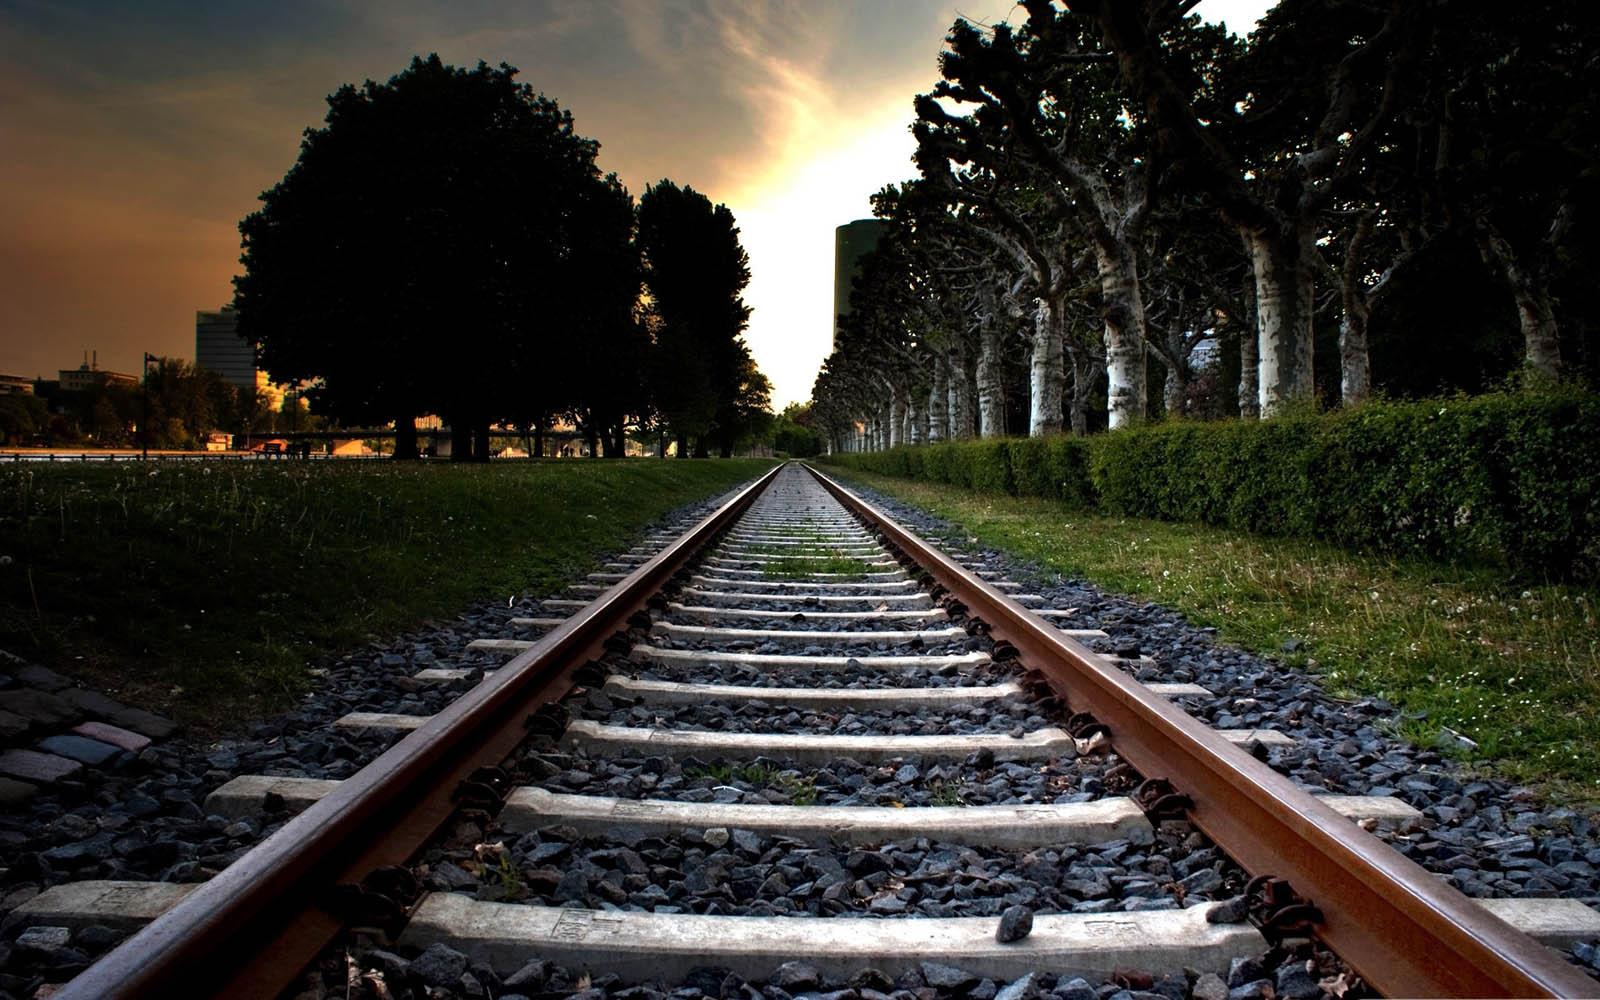 Ada Yang Tahu Mengapa Rel Kereta Api Dipenuhi Dengan Batu Kerikil Maksud Dari Bantalan Pemberat Di Adalah Karena Dapat Berfungsi Sebagi Alat Tentunya Fungsi Ini Bermanfaat Agar